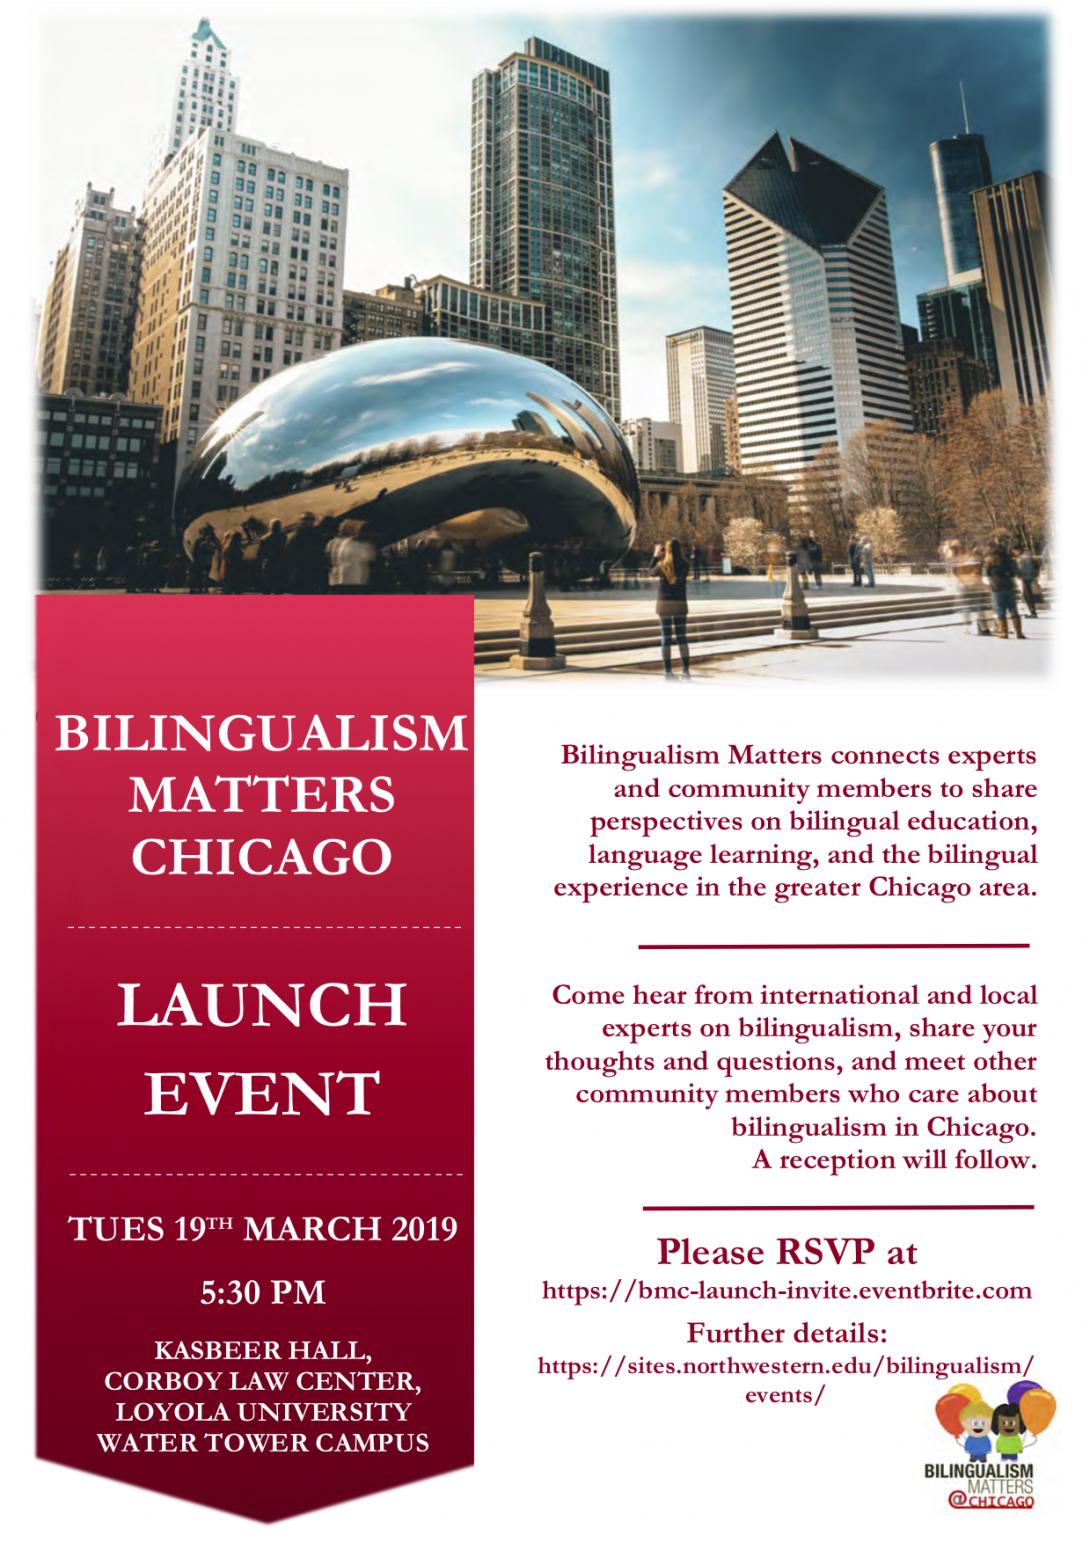 Bilingualism Matters Chicago Kickoff